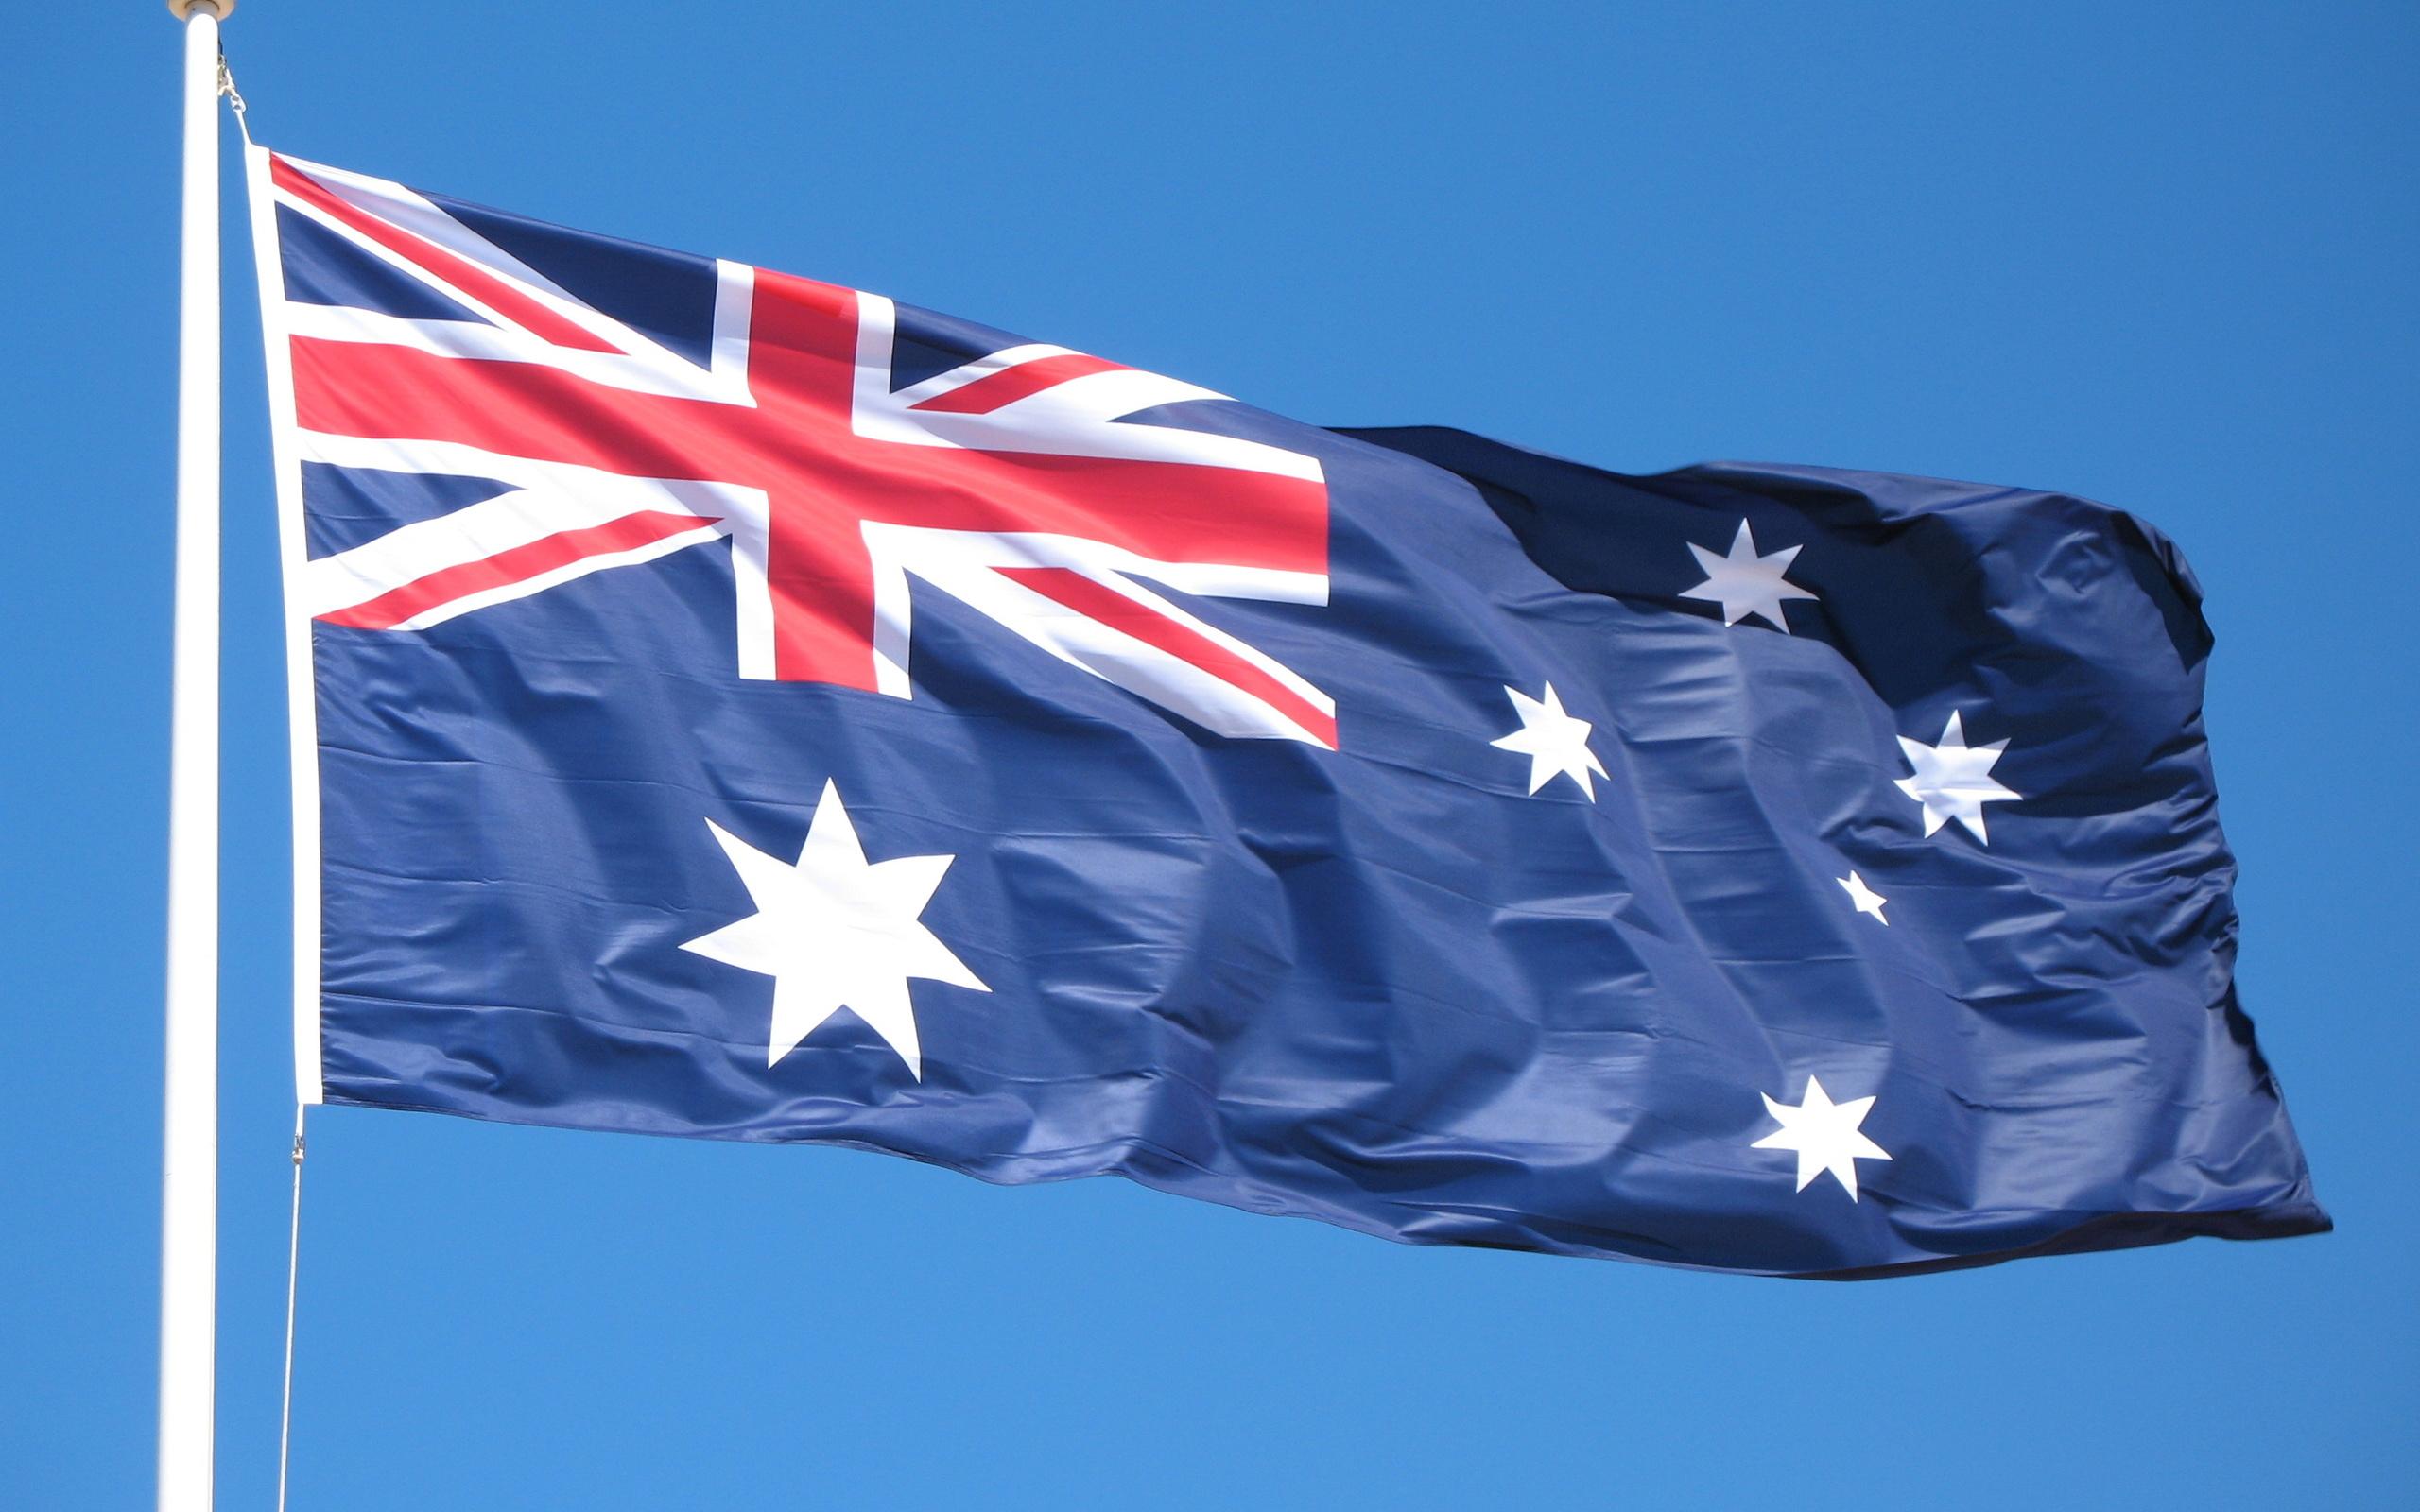 австралия, флаг, голубой